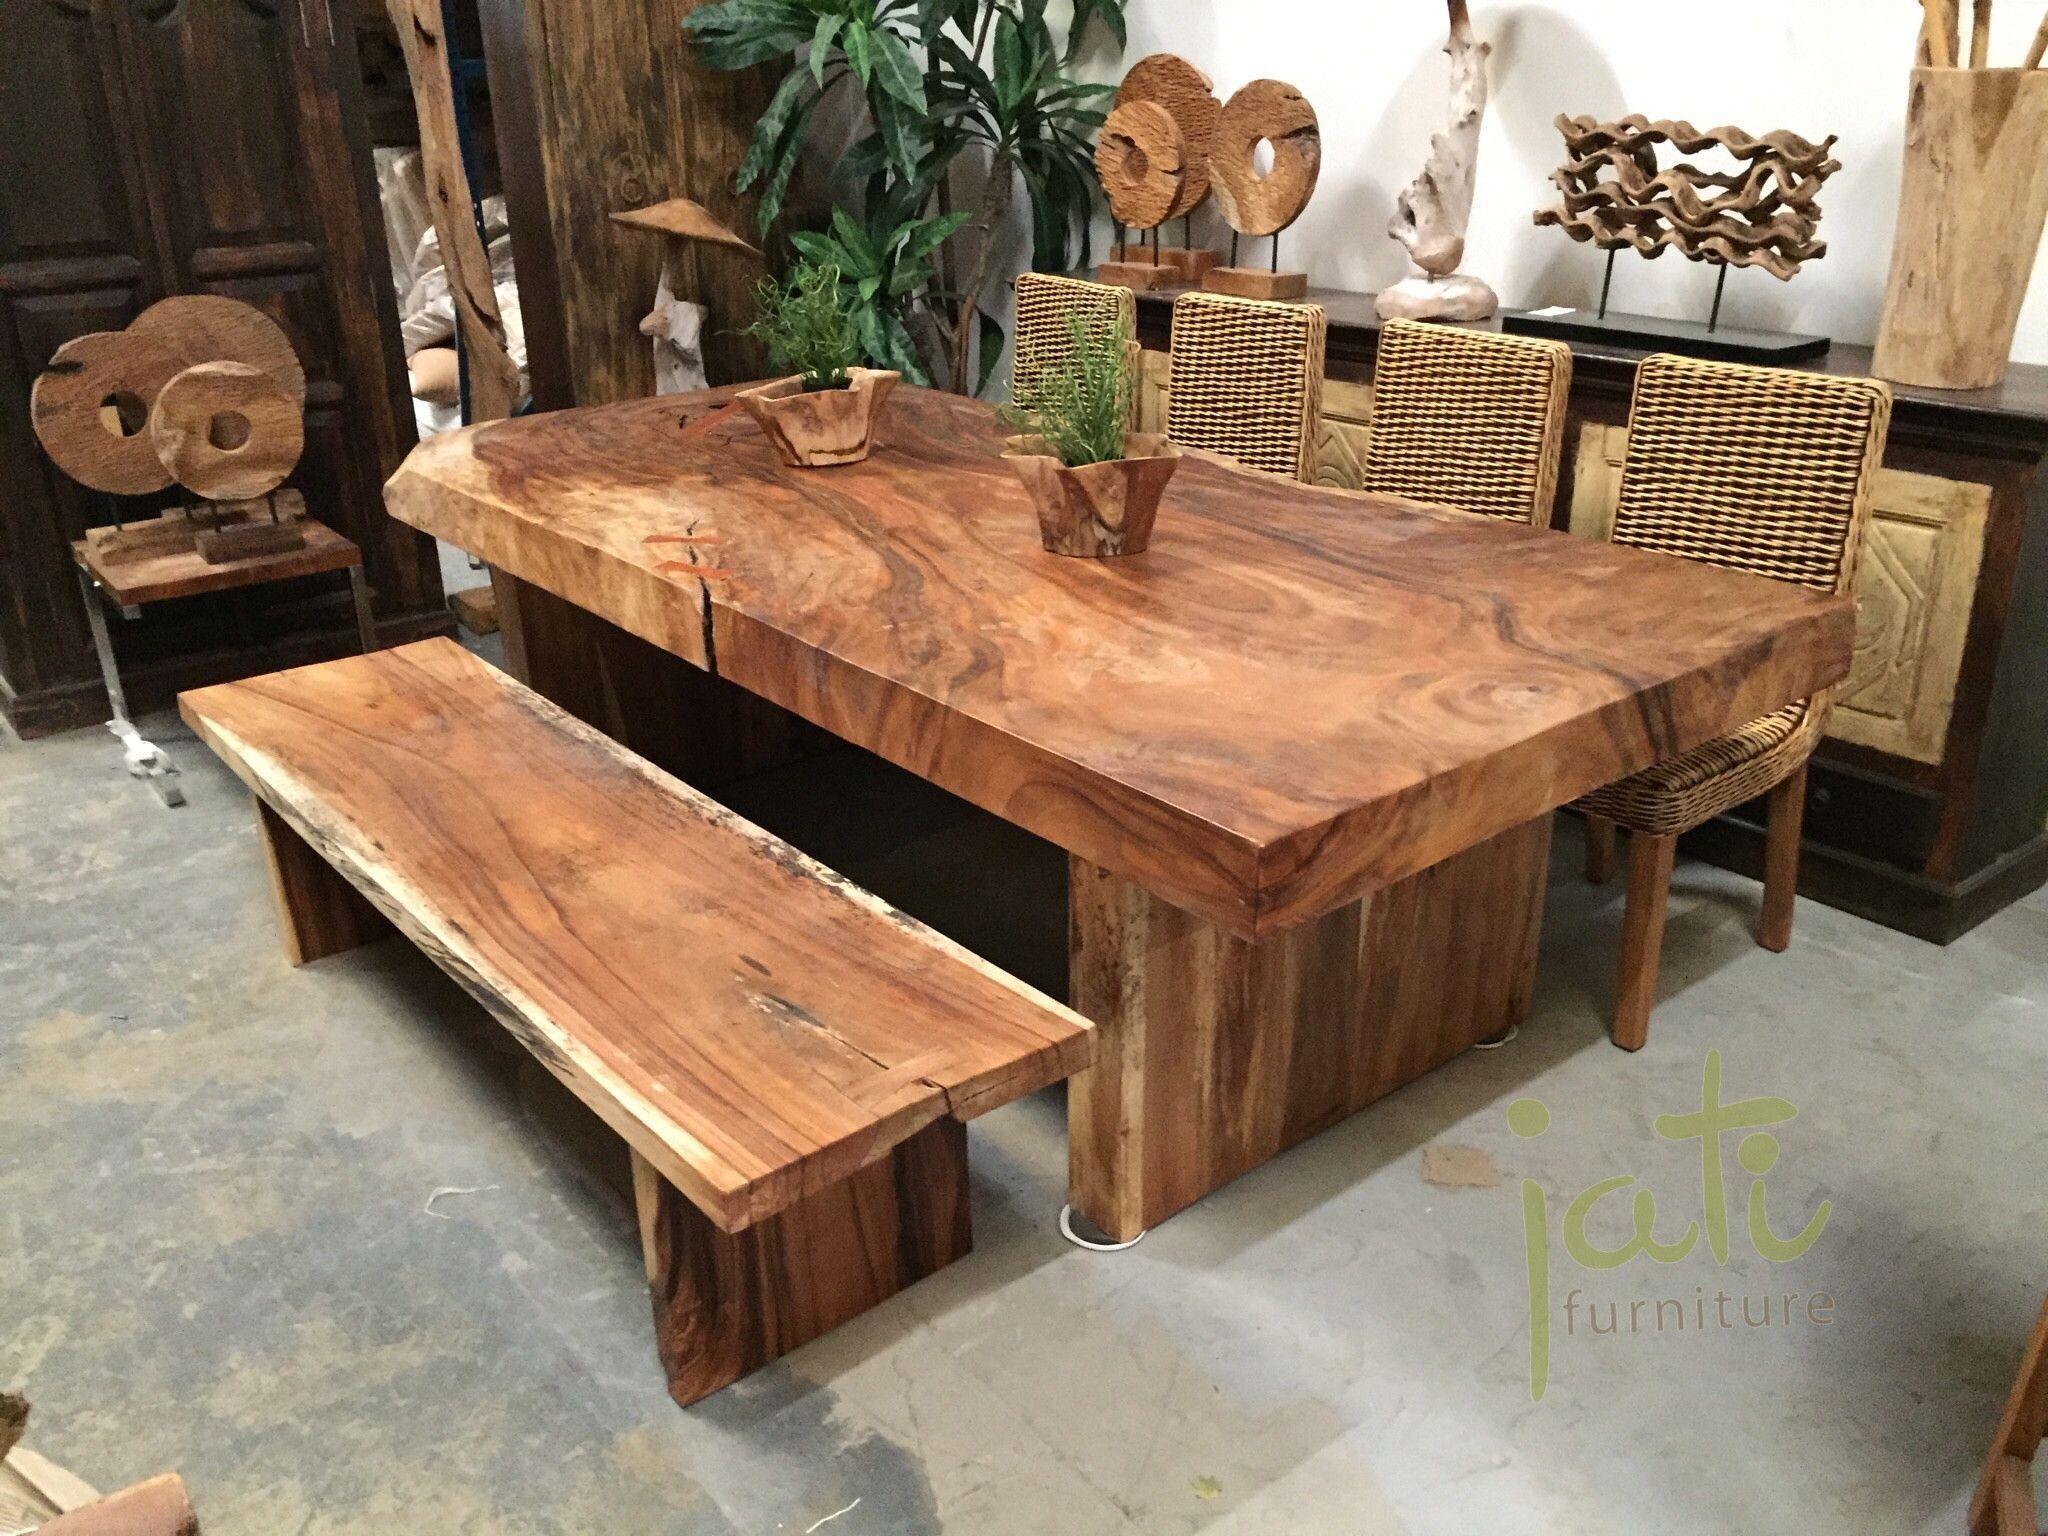 Solid Wood Table Root Table Unique Log Table Dining Gaya Rumah Mebel Meja Kayu